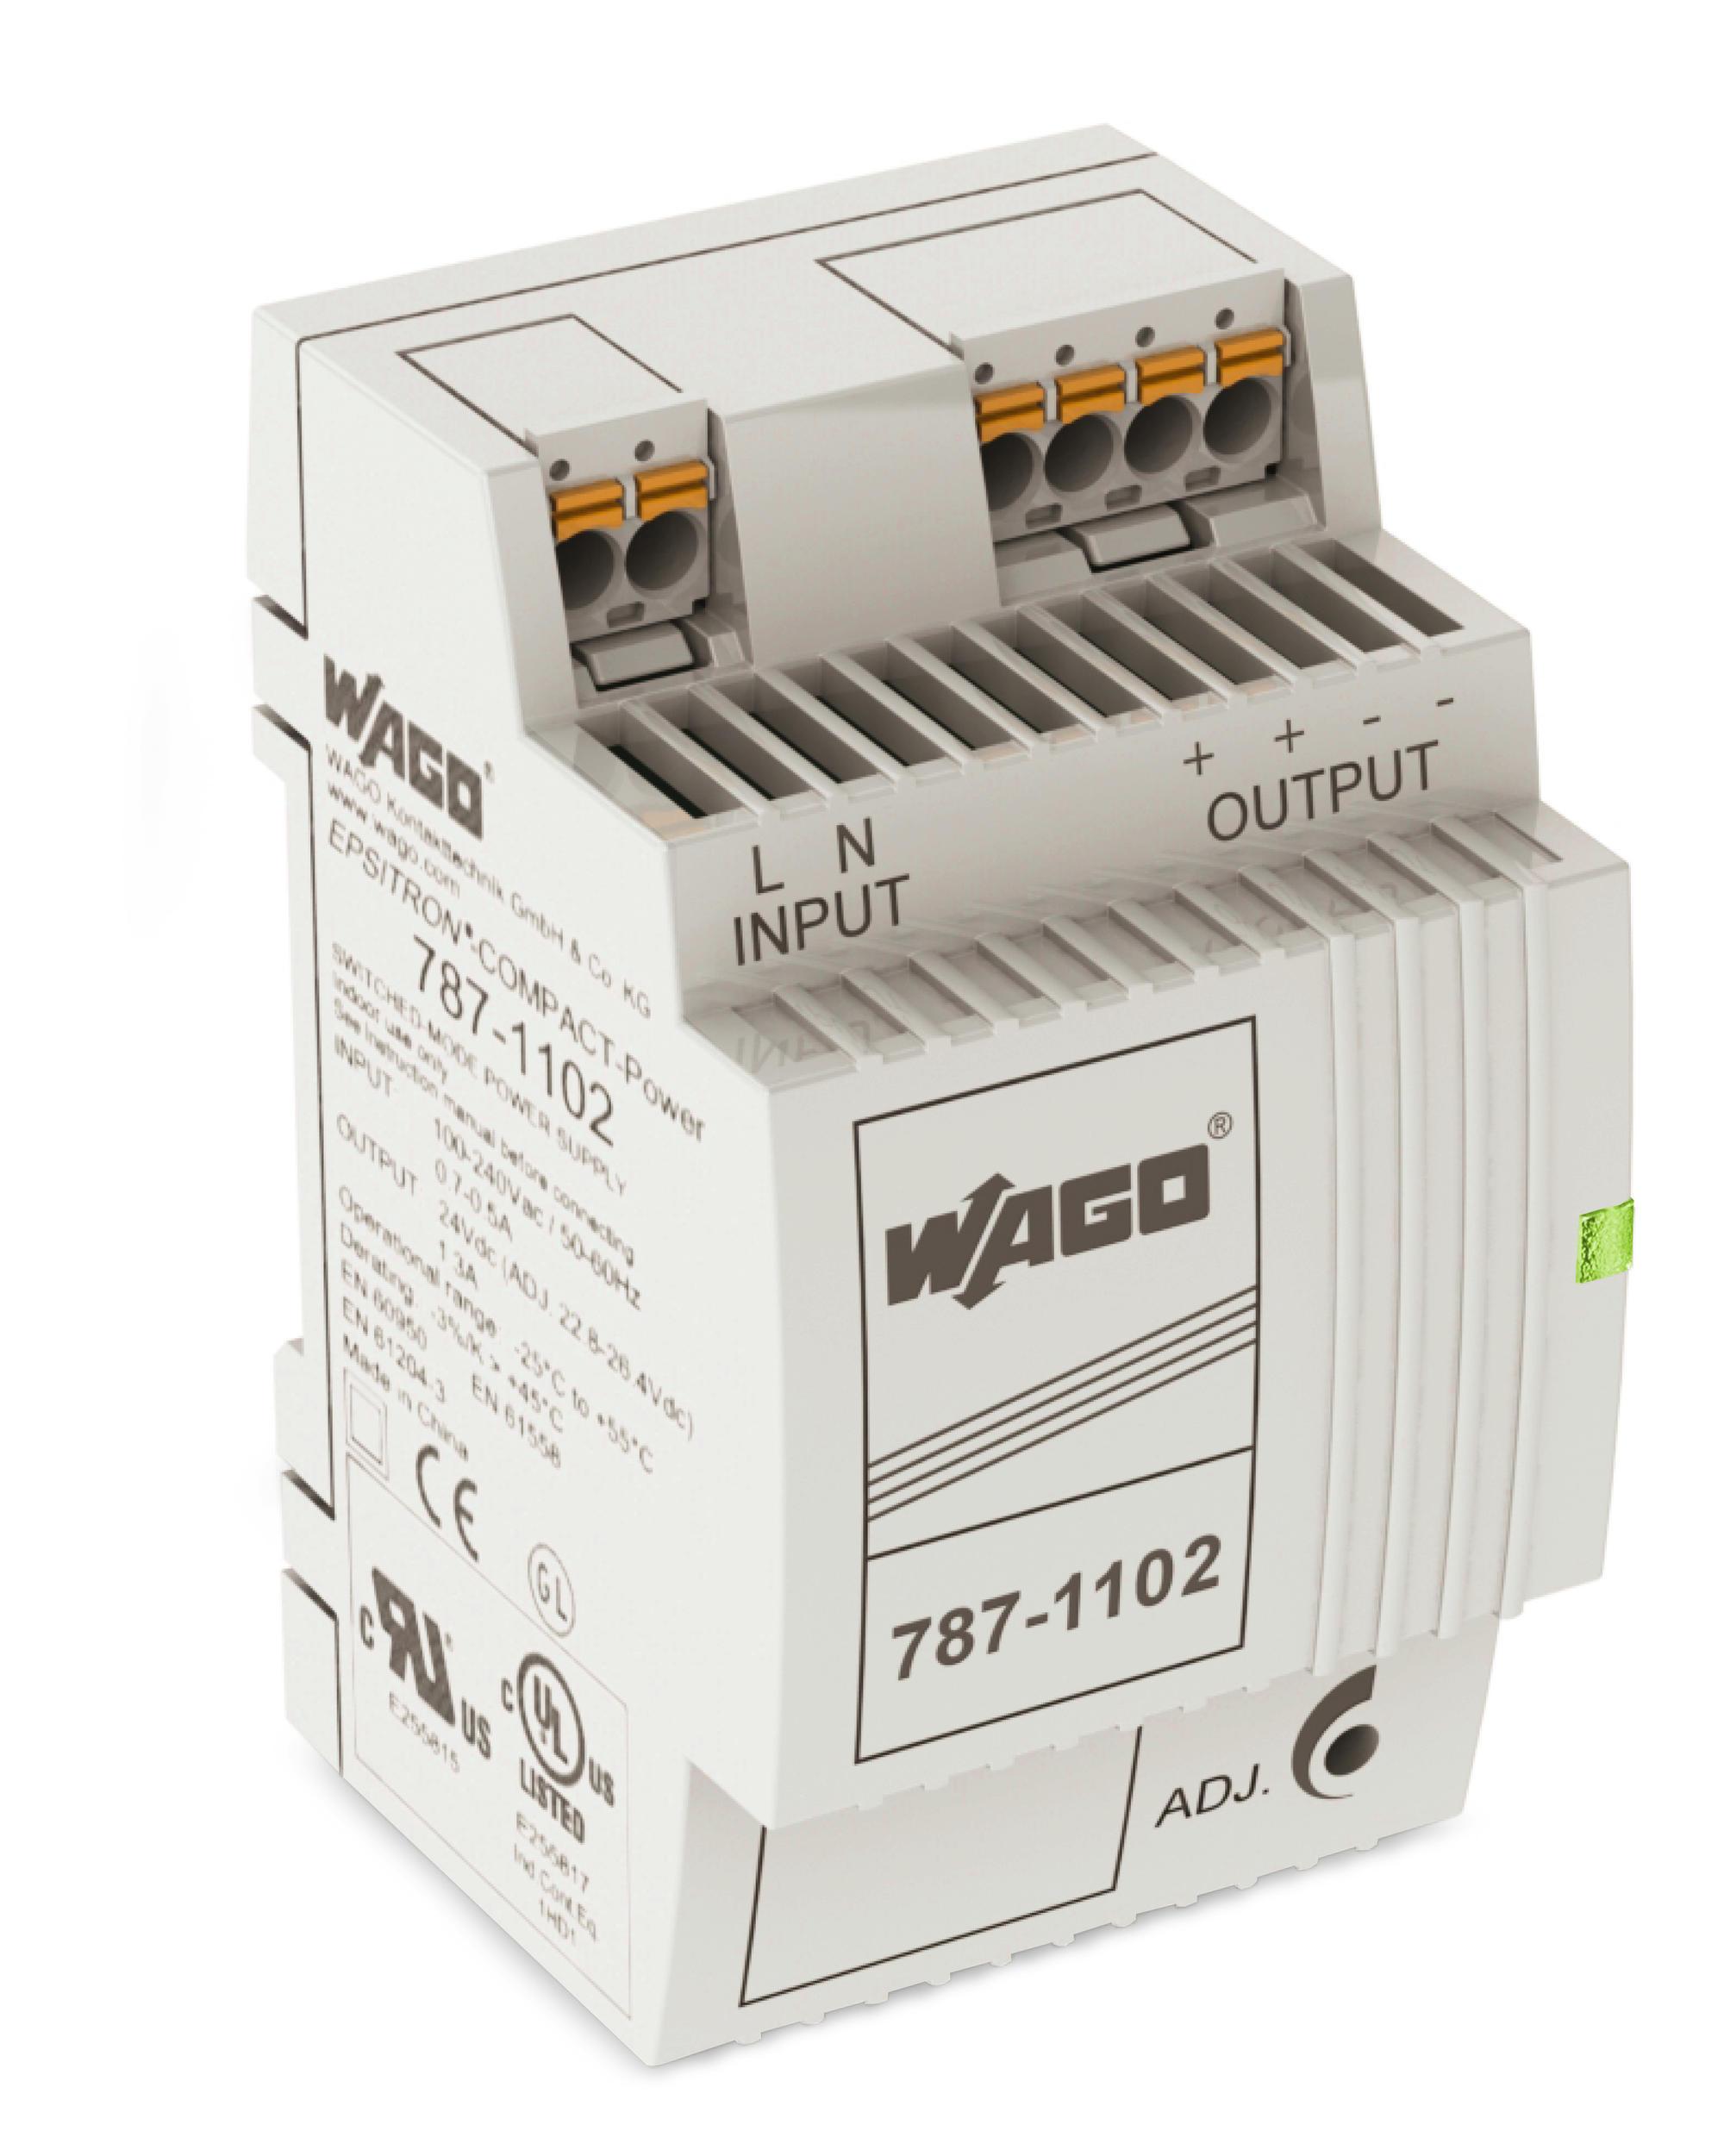 Wago Epsitron Compact Power Supply 787 1102 Avo 8 Circuit Diagram